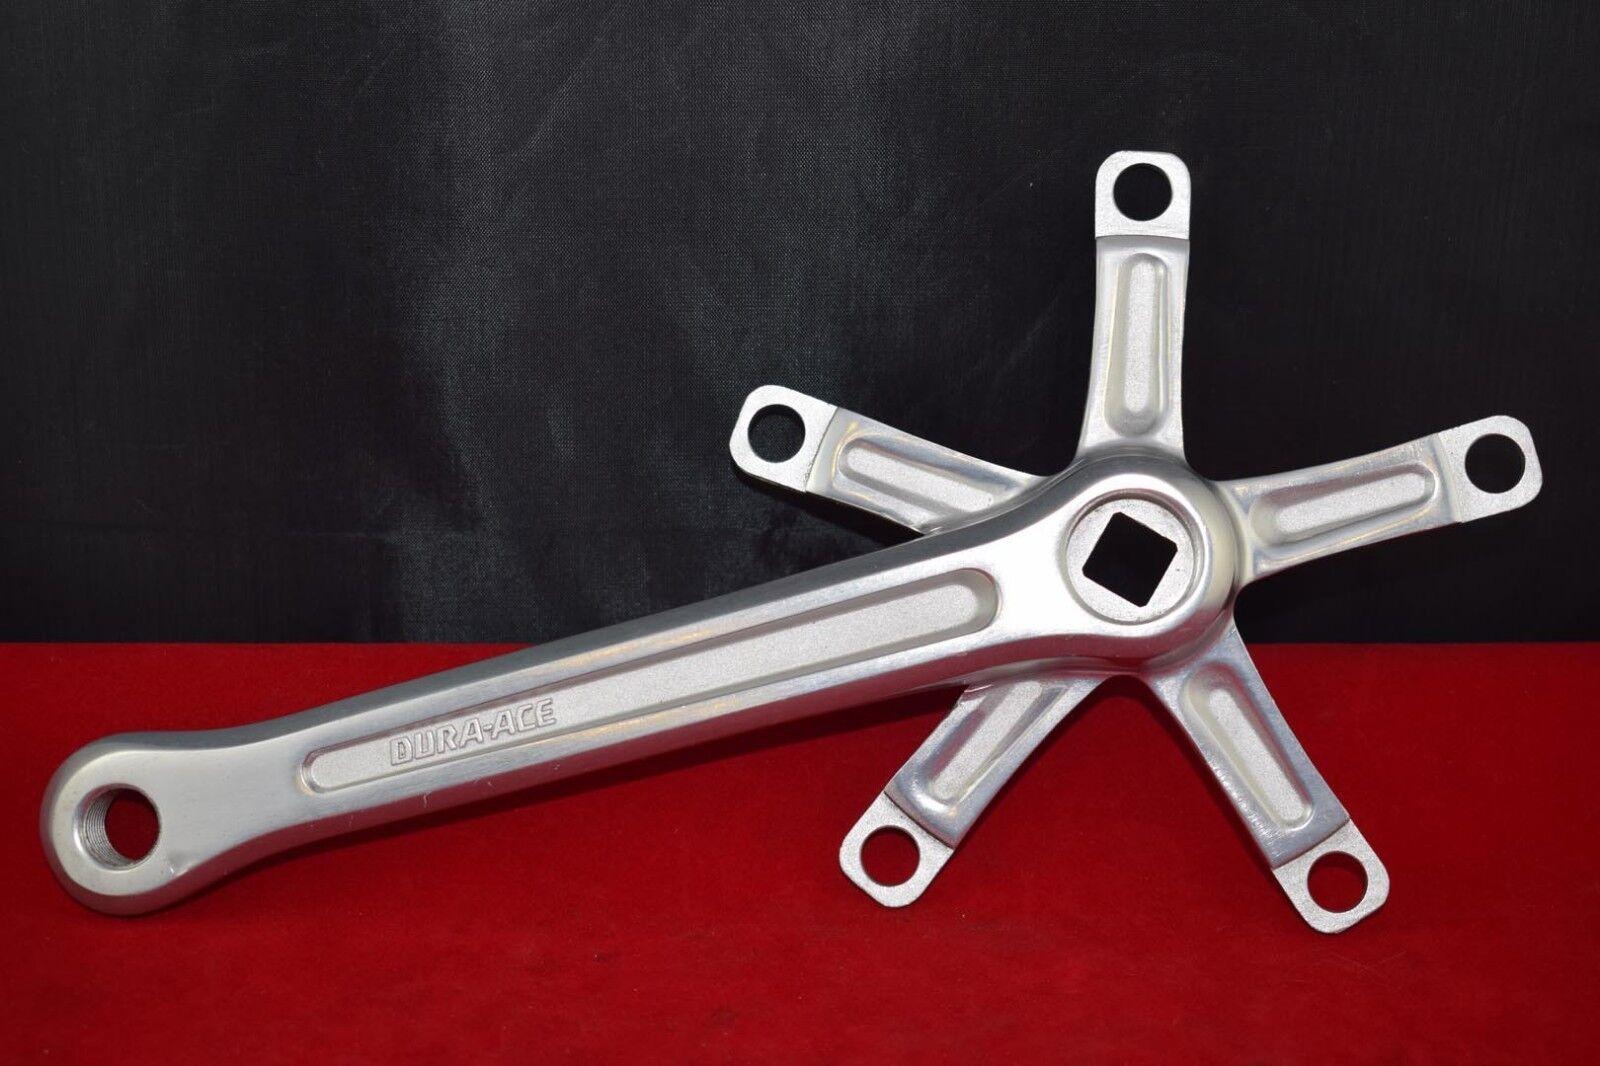 Shimano DURA-ACE Kurbel Arm rechts Kettenblatt Seite 175 mm BCD 130 Aluminium NOS